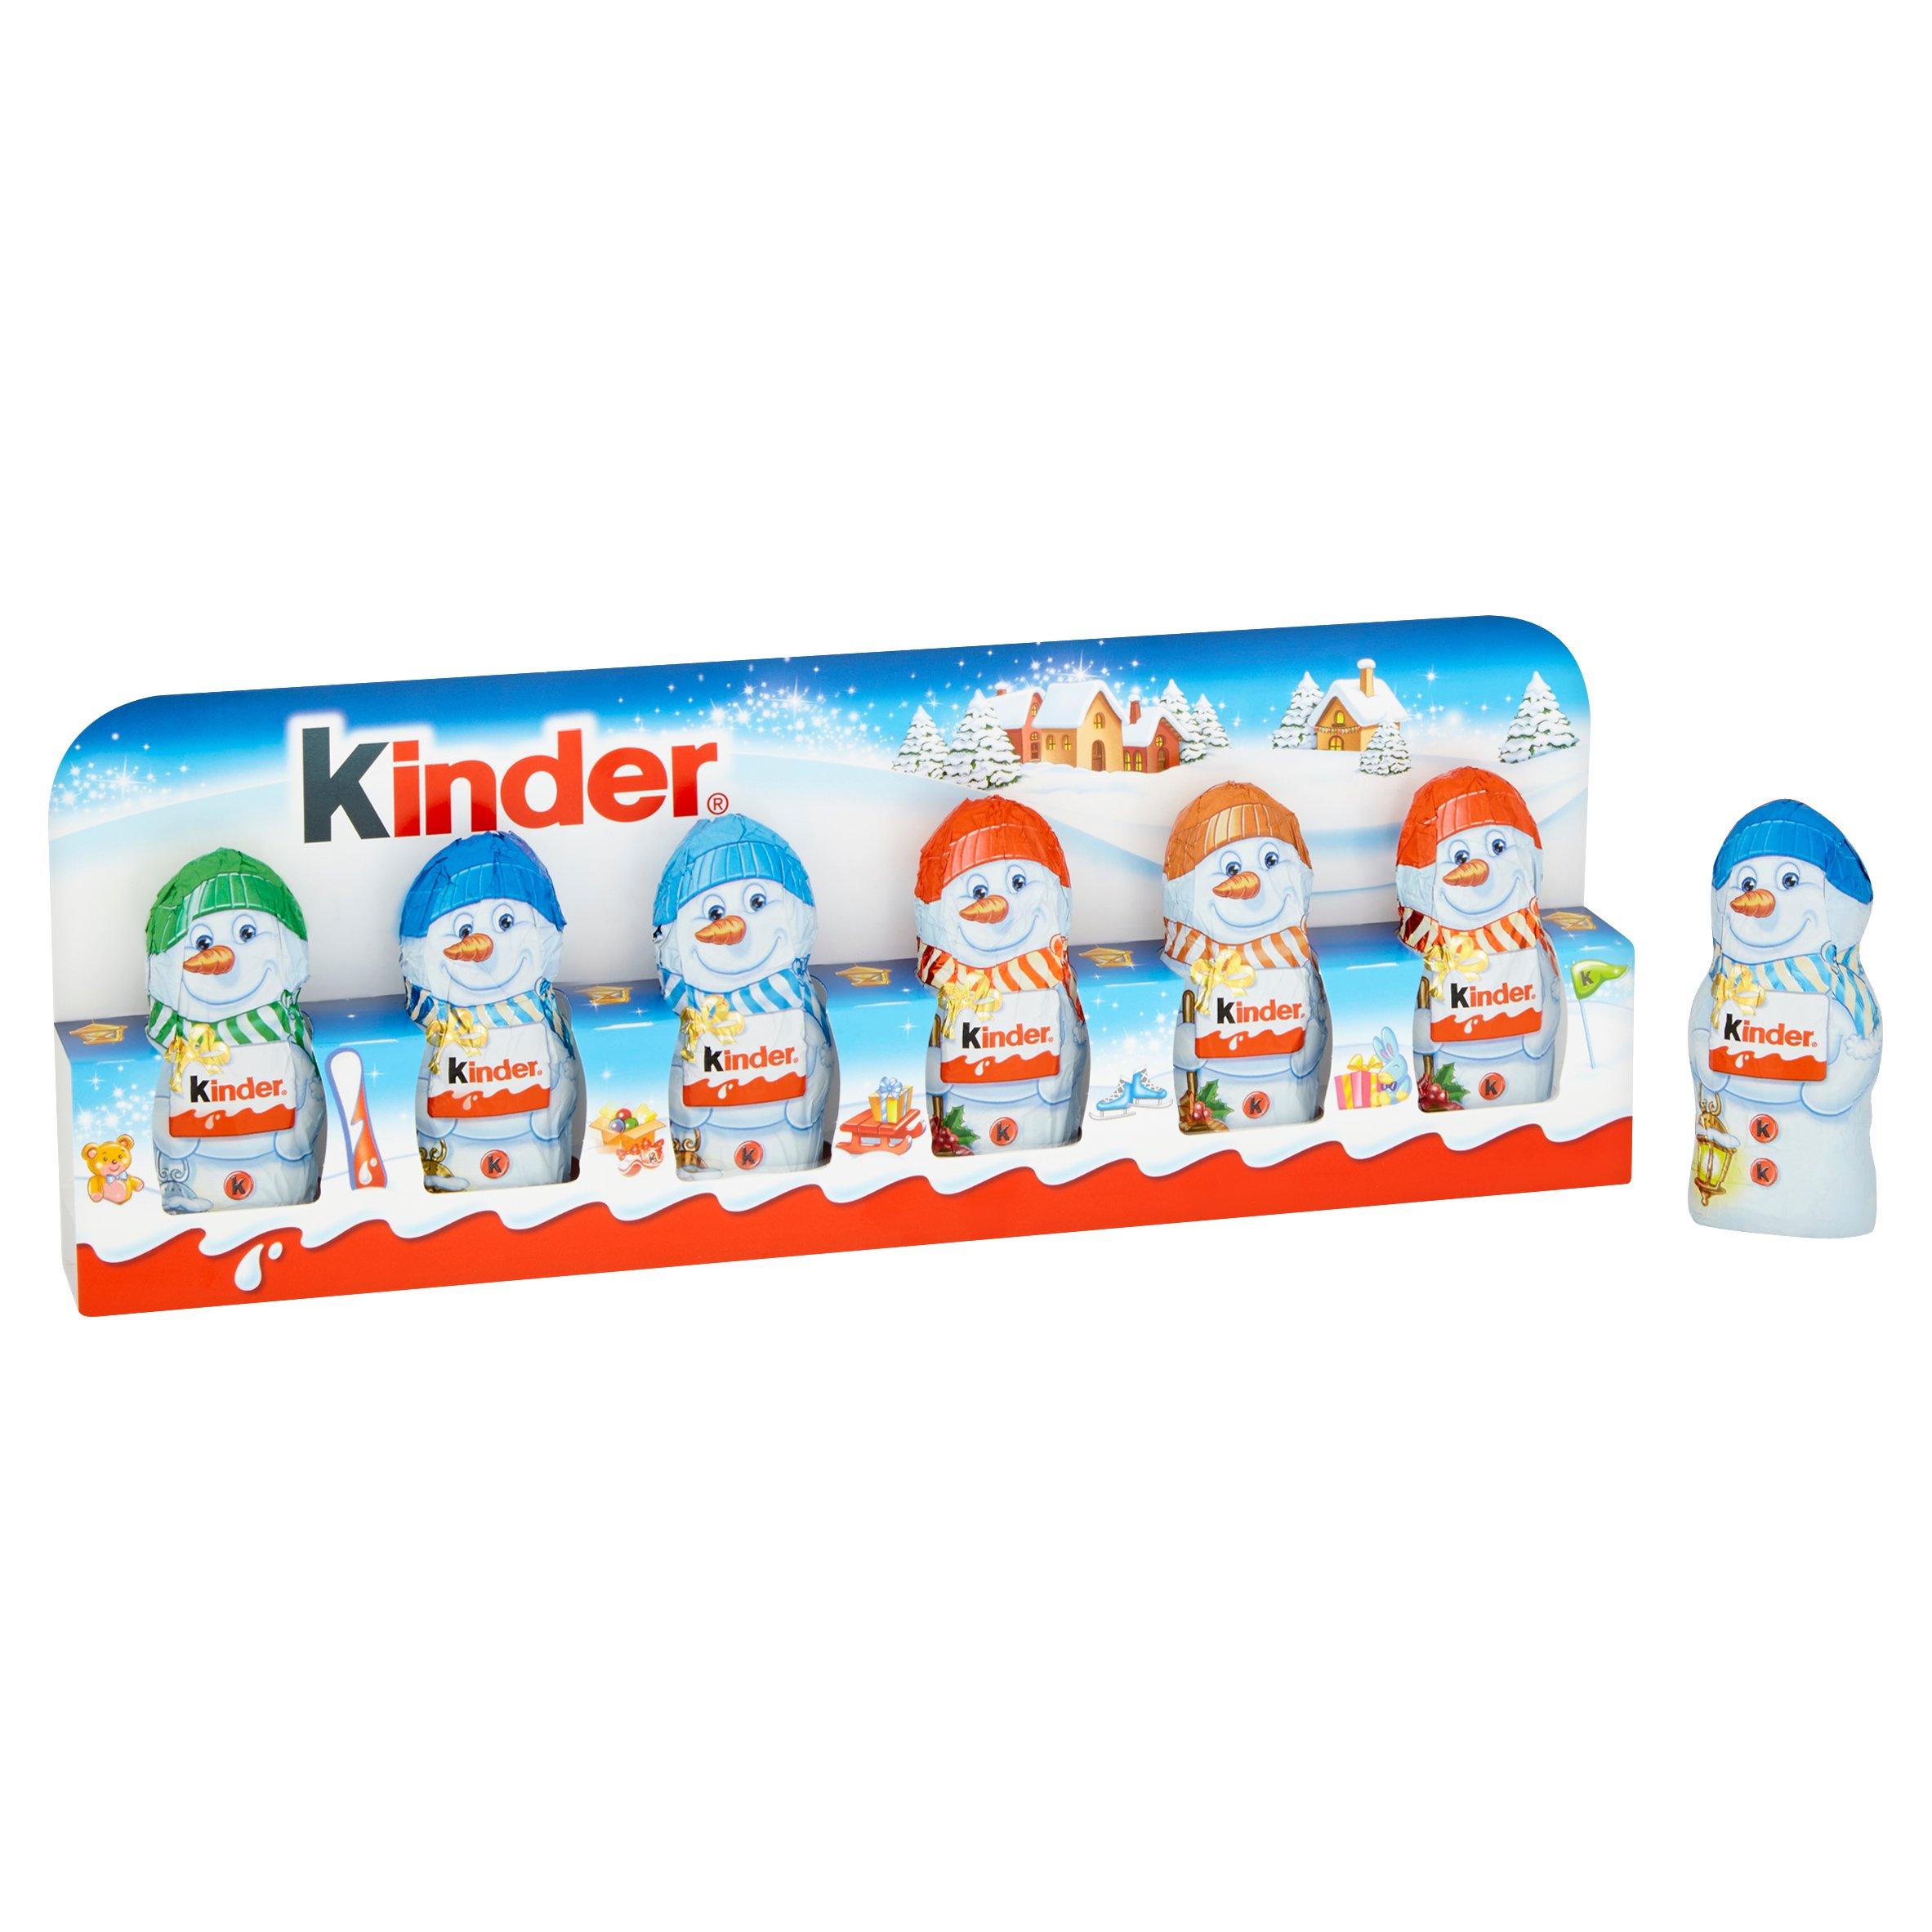 image 1 of Kinder Mini Figures 6 Pack